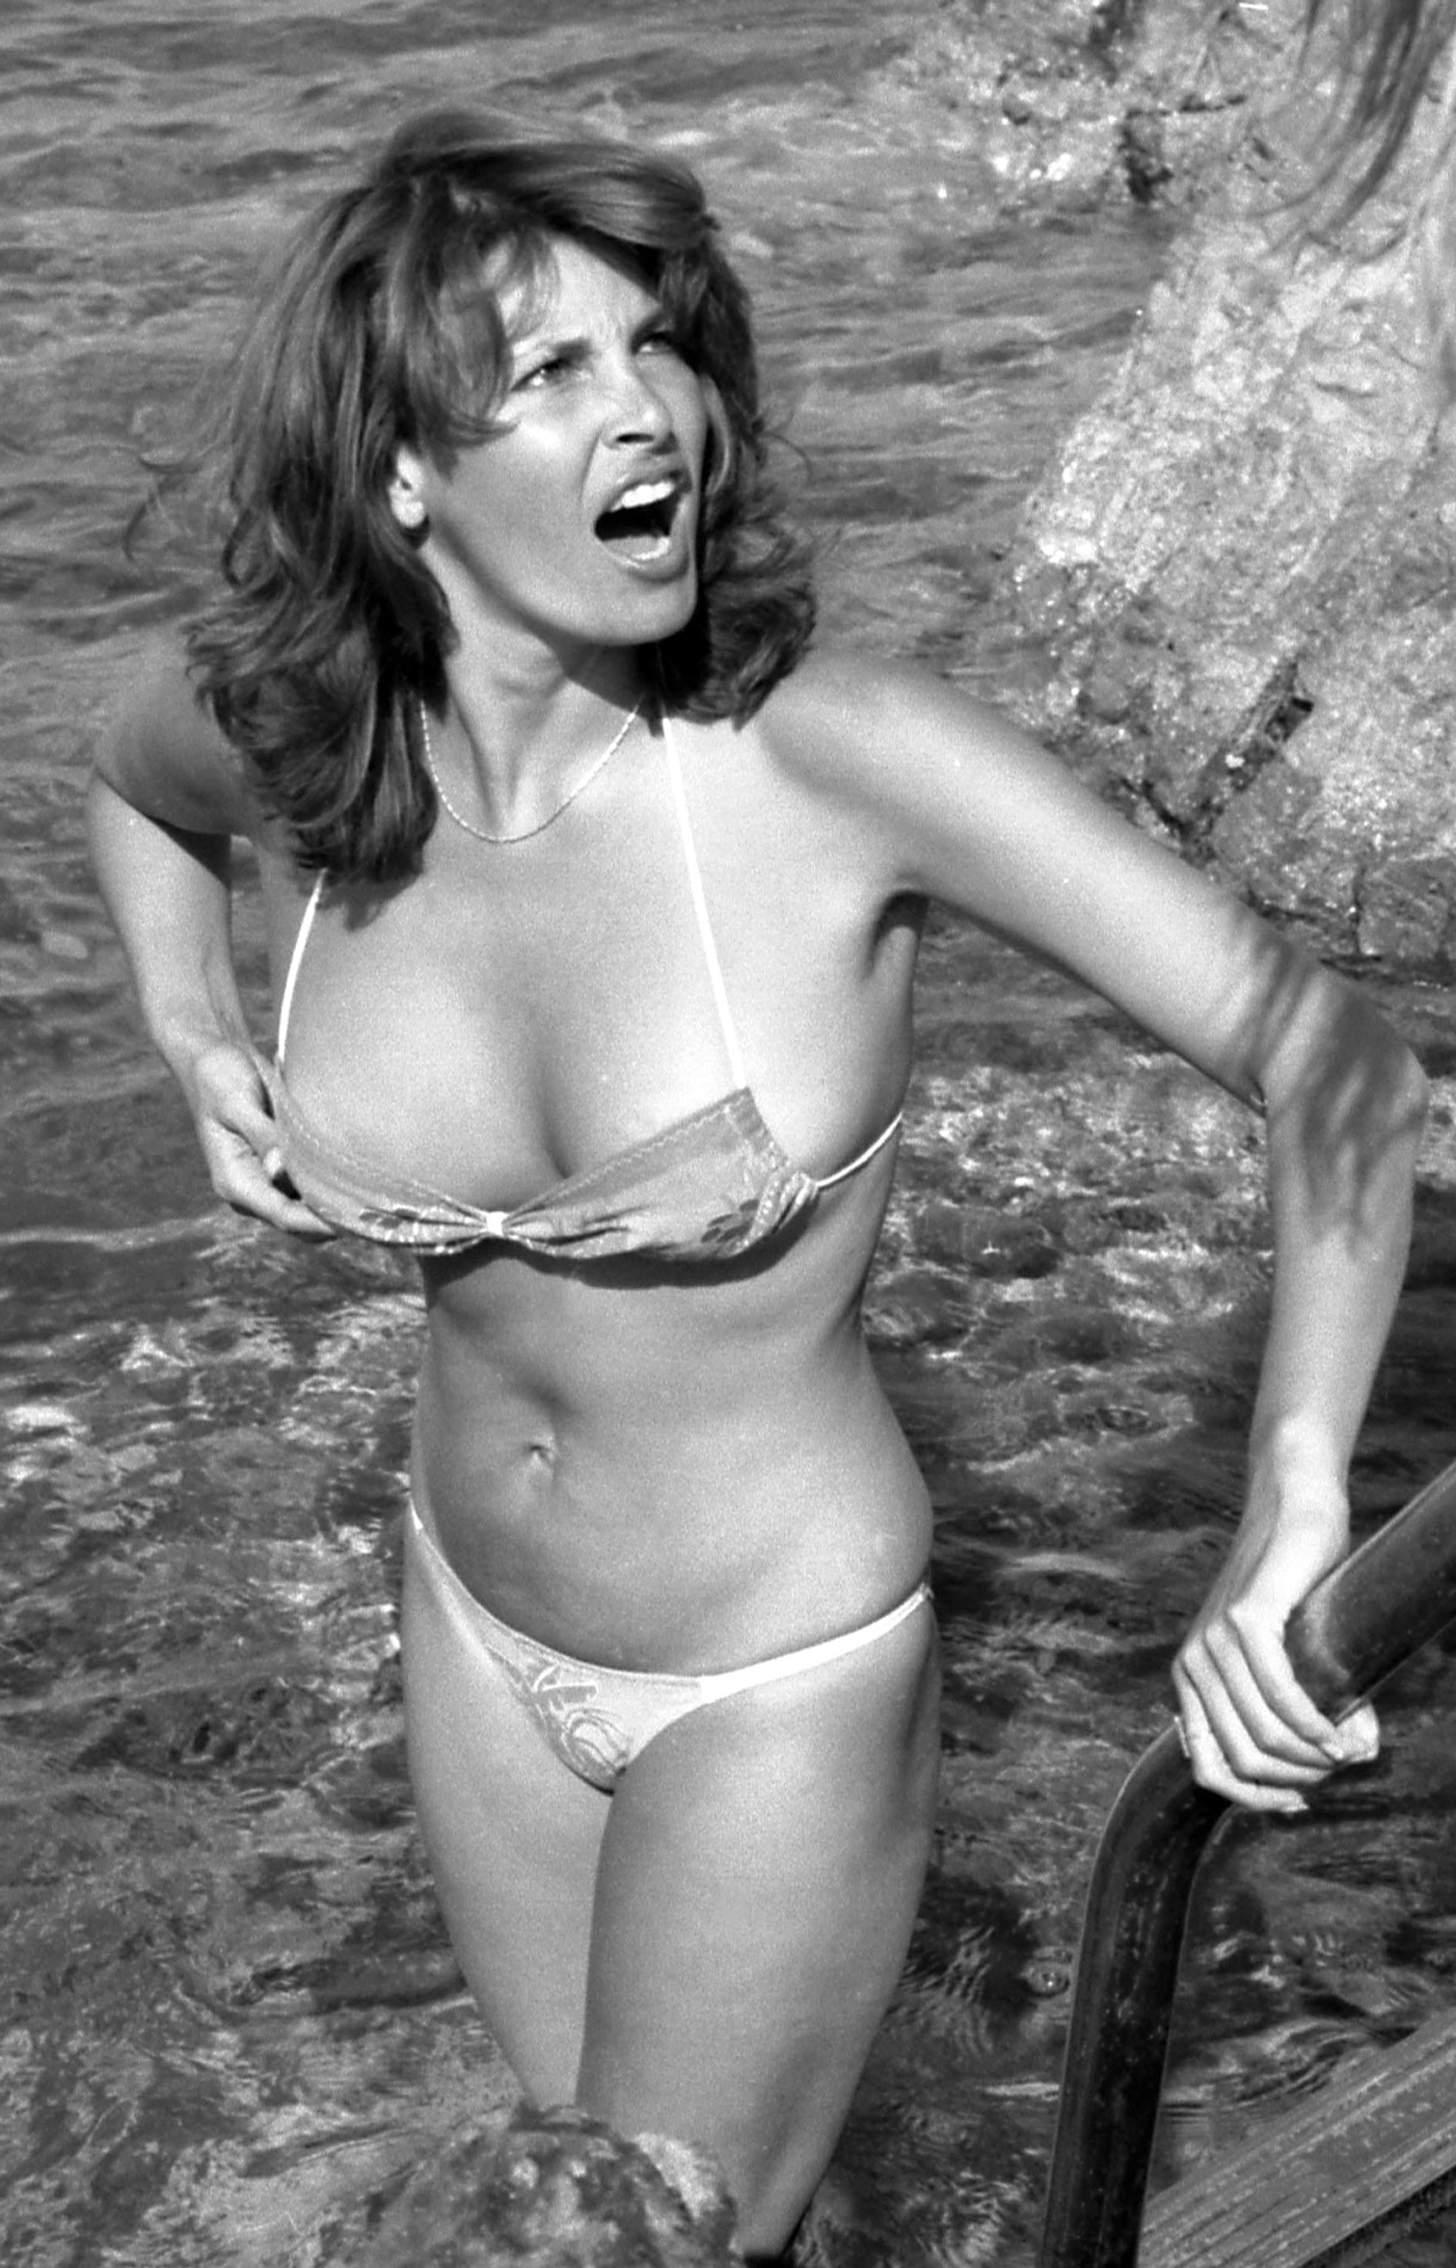 Topless Sexy Veronica Sywak  nudes (68 fotos), Instagram, cameltoe